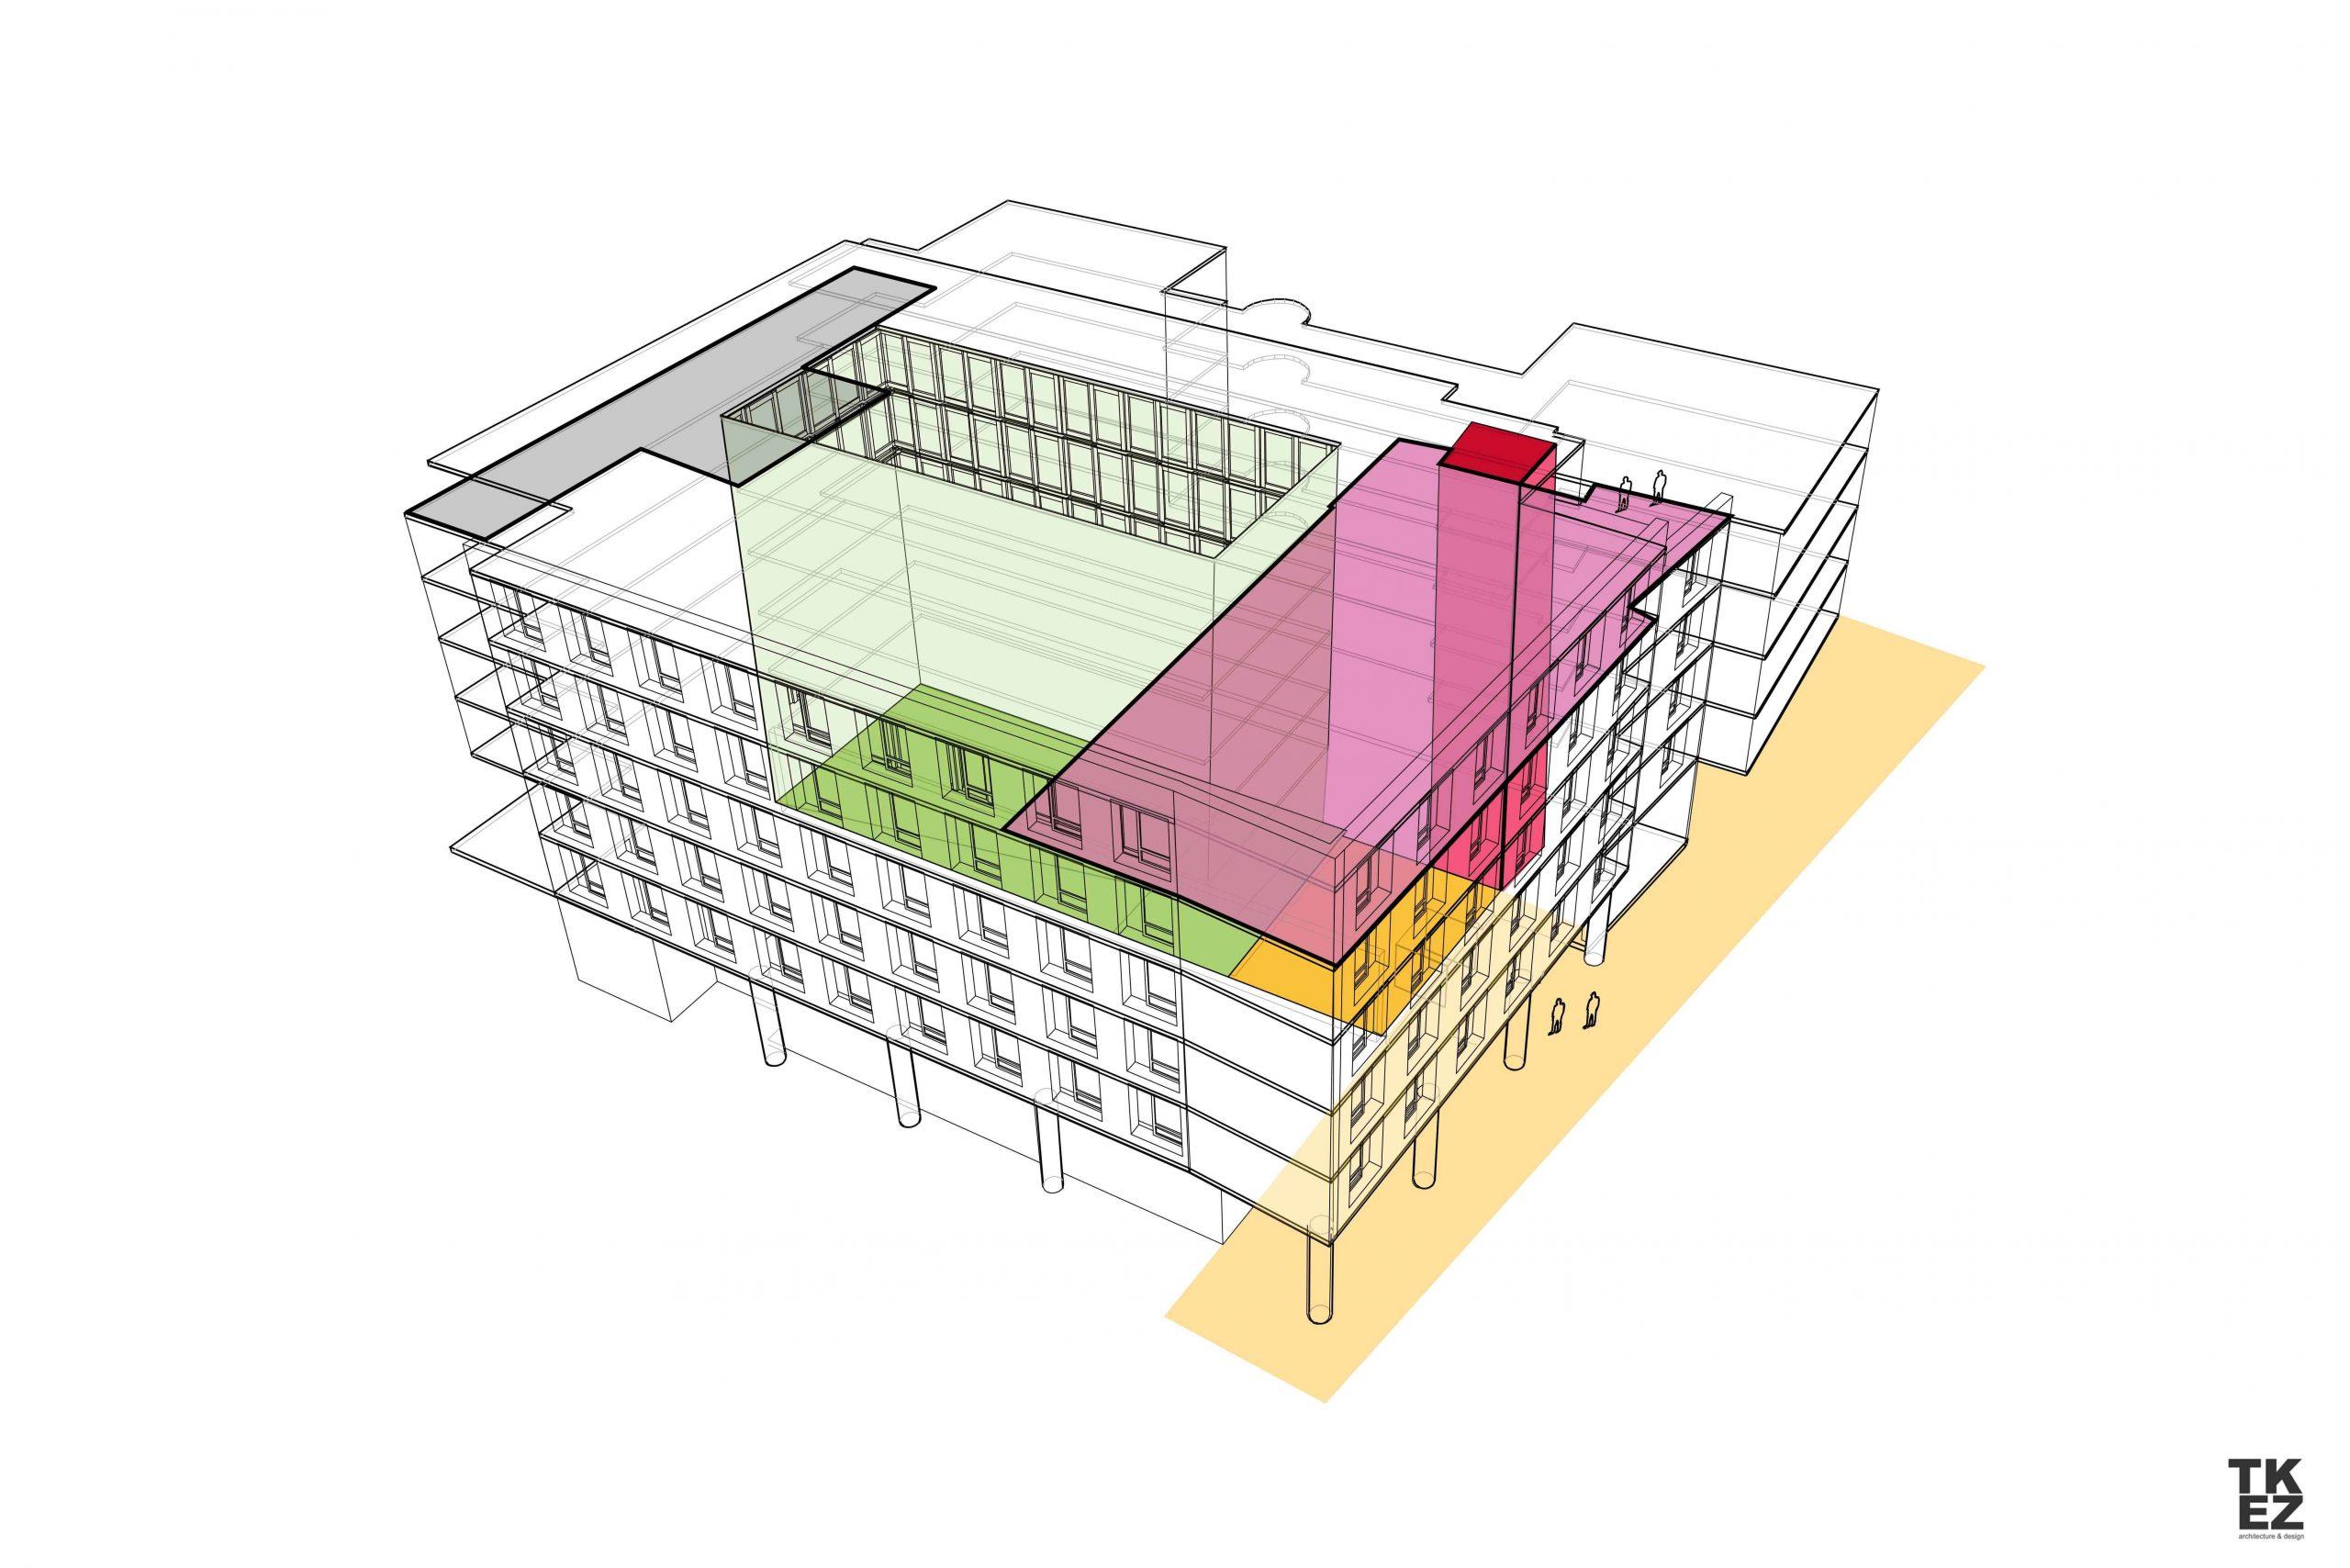 Neues Büro Bain & Company TKEZ München Modellansicht